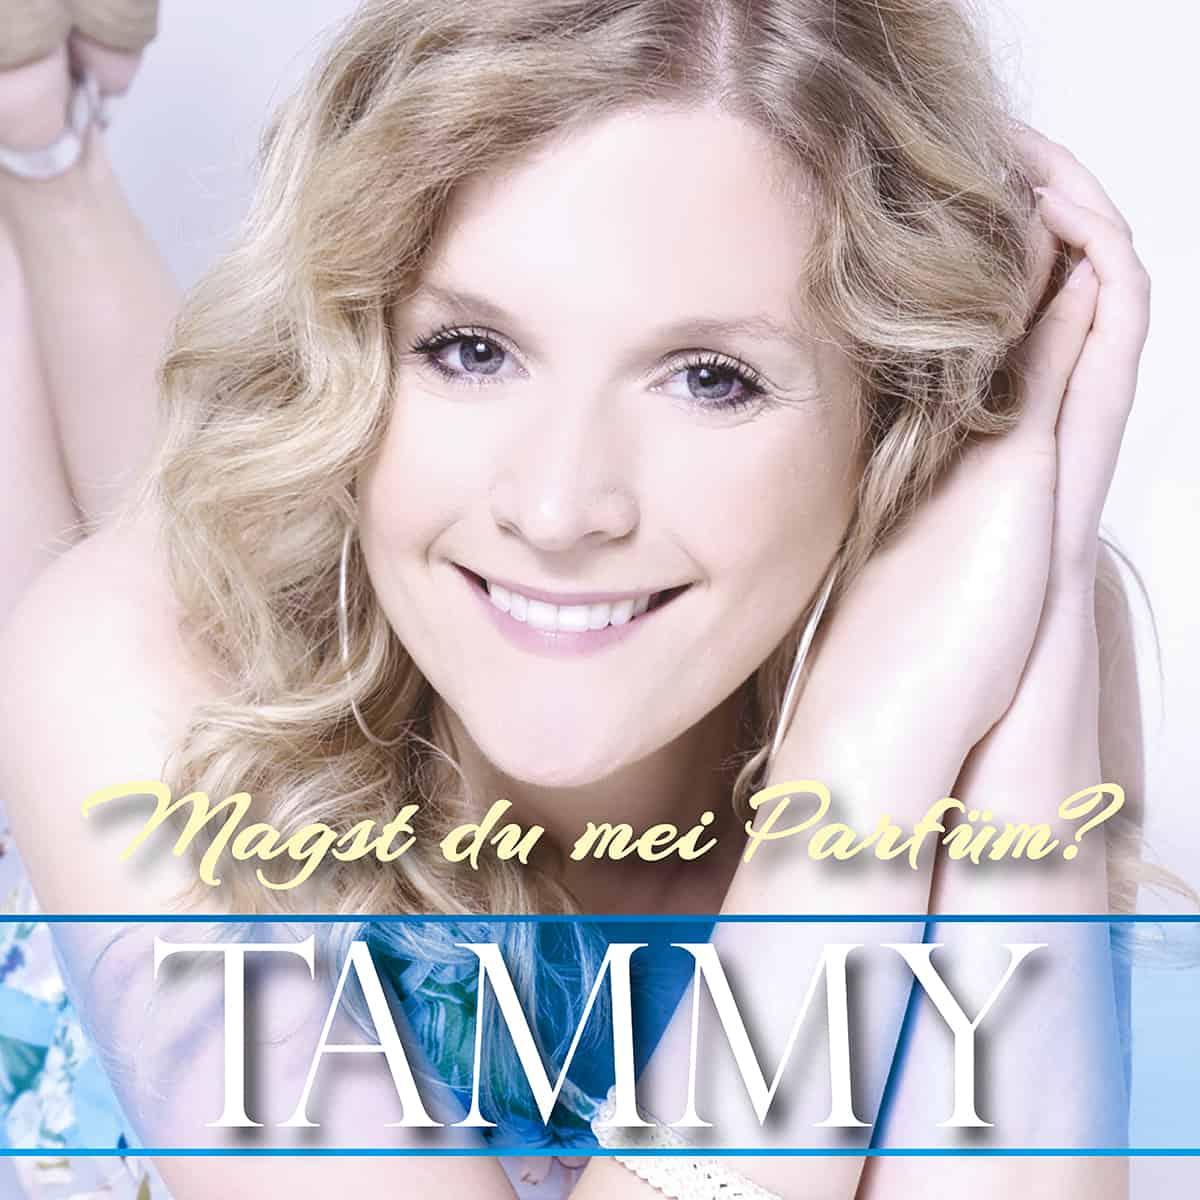 Tammy – Magst du mei Parfüm? (2020)